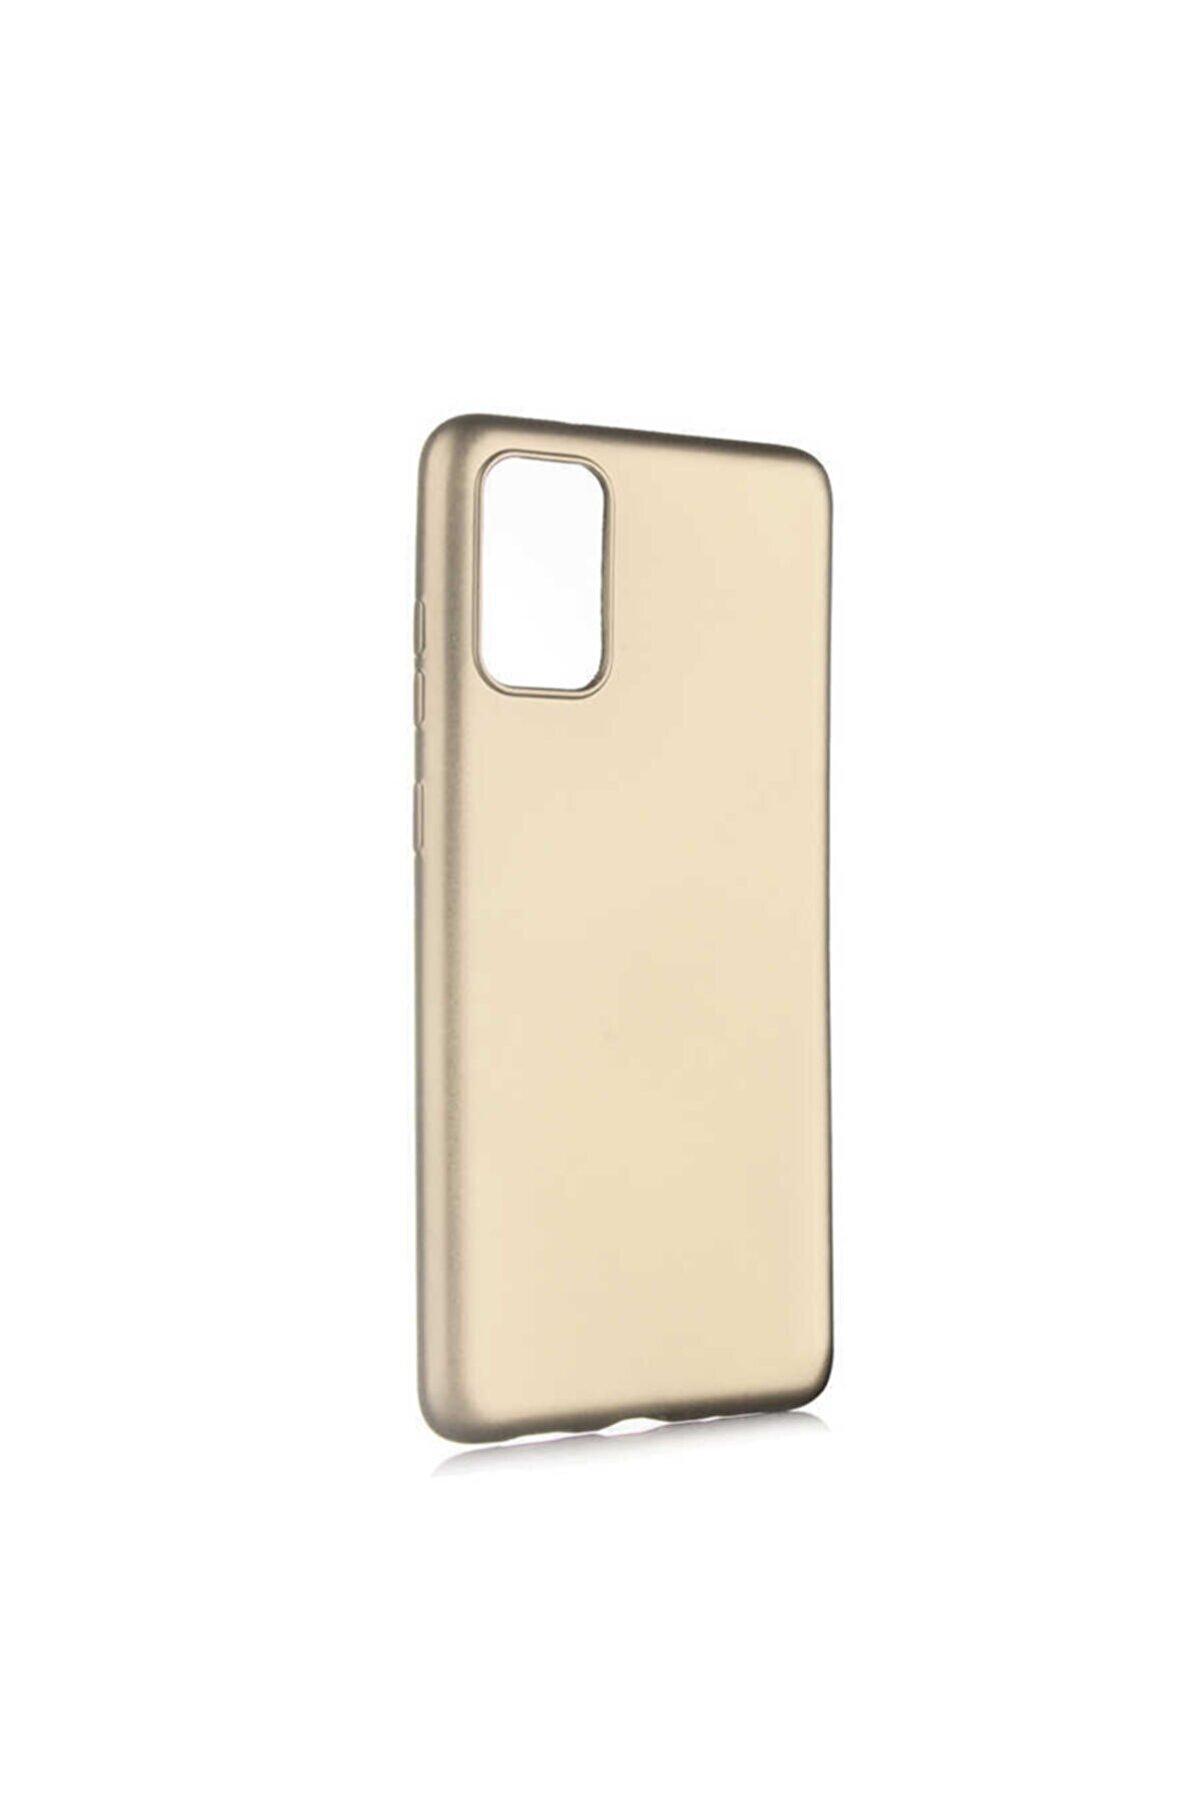 Zore Galaxy S20 Plus Gold Ultra Soft 1.kalite Silikon Kılıf